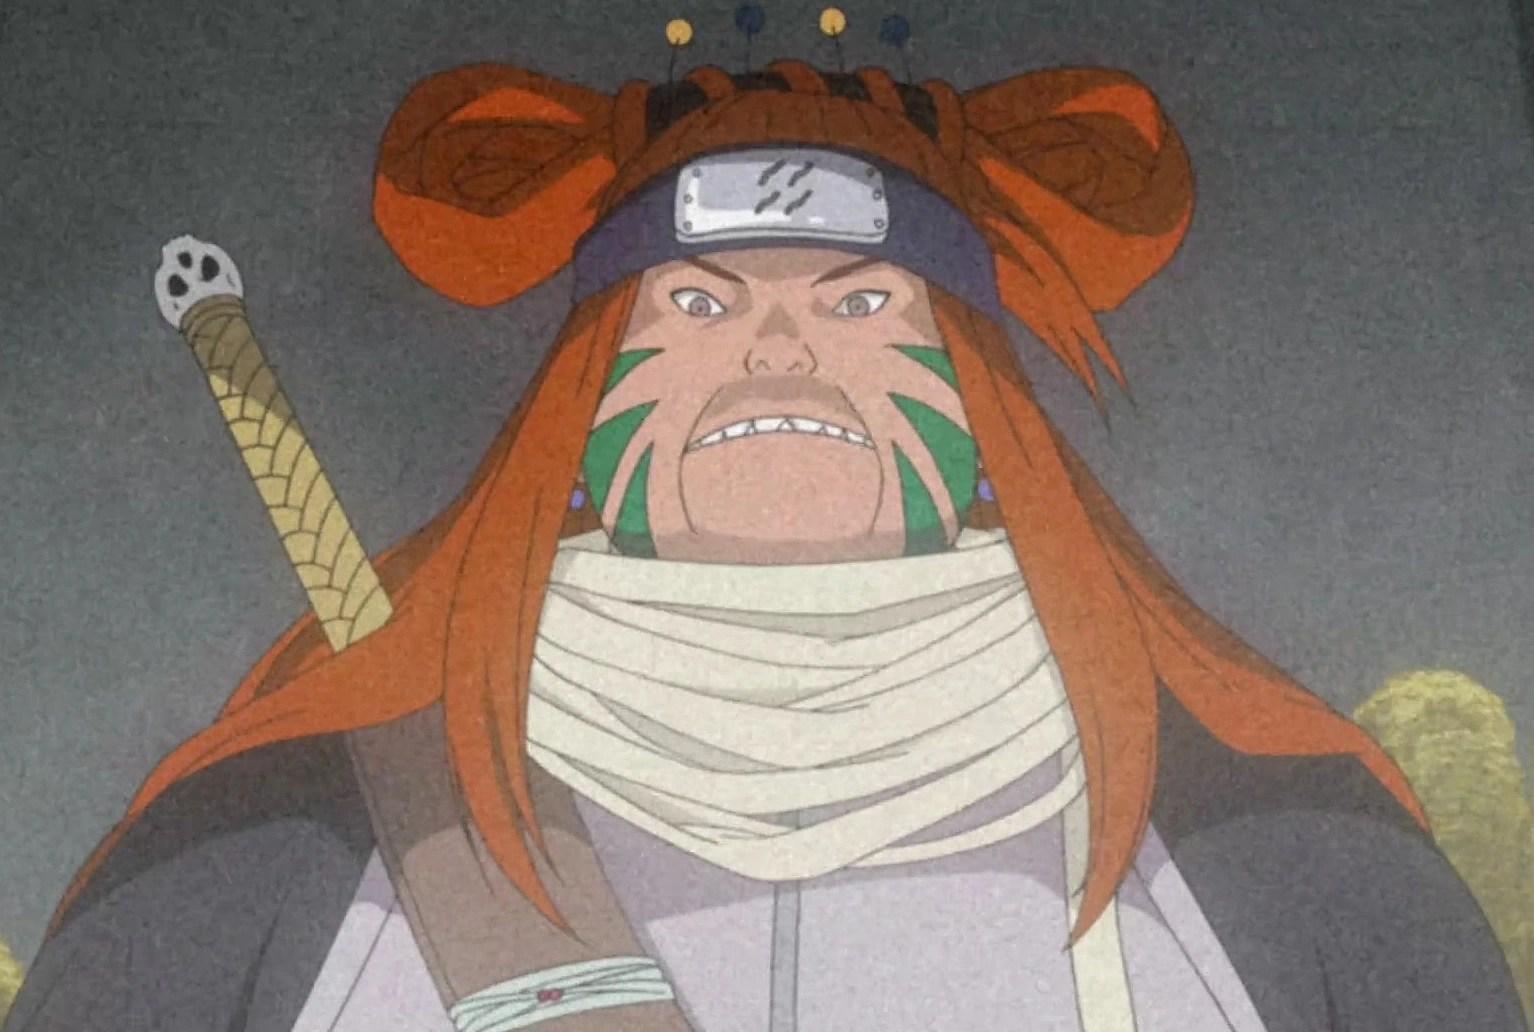 Fuguki Suikazan Narutopedia Fandom powered by Wikia